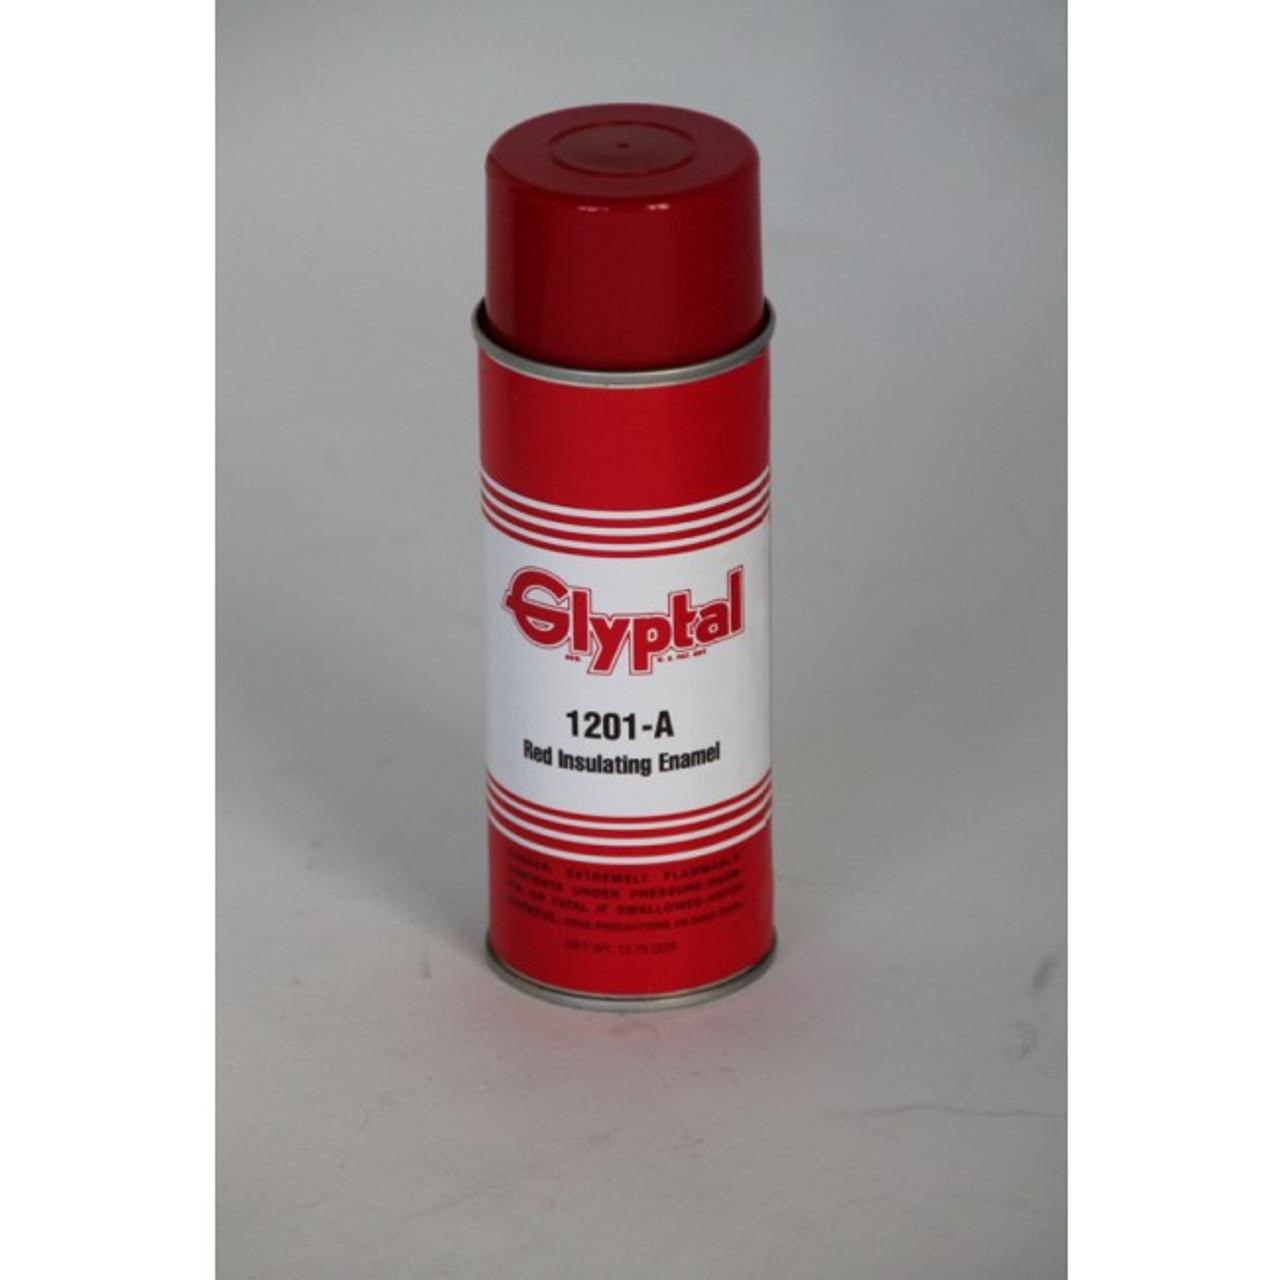 Glyptal Internal Engine Red Enamel Paint Aerosol (345g)